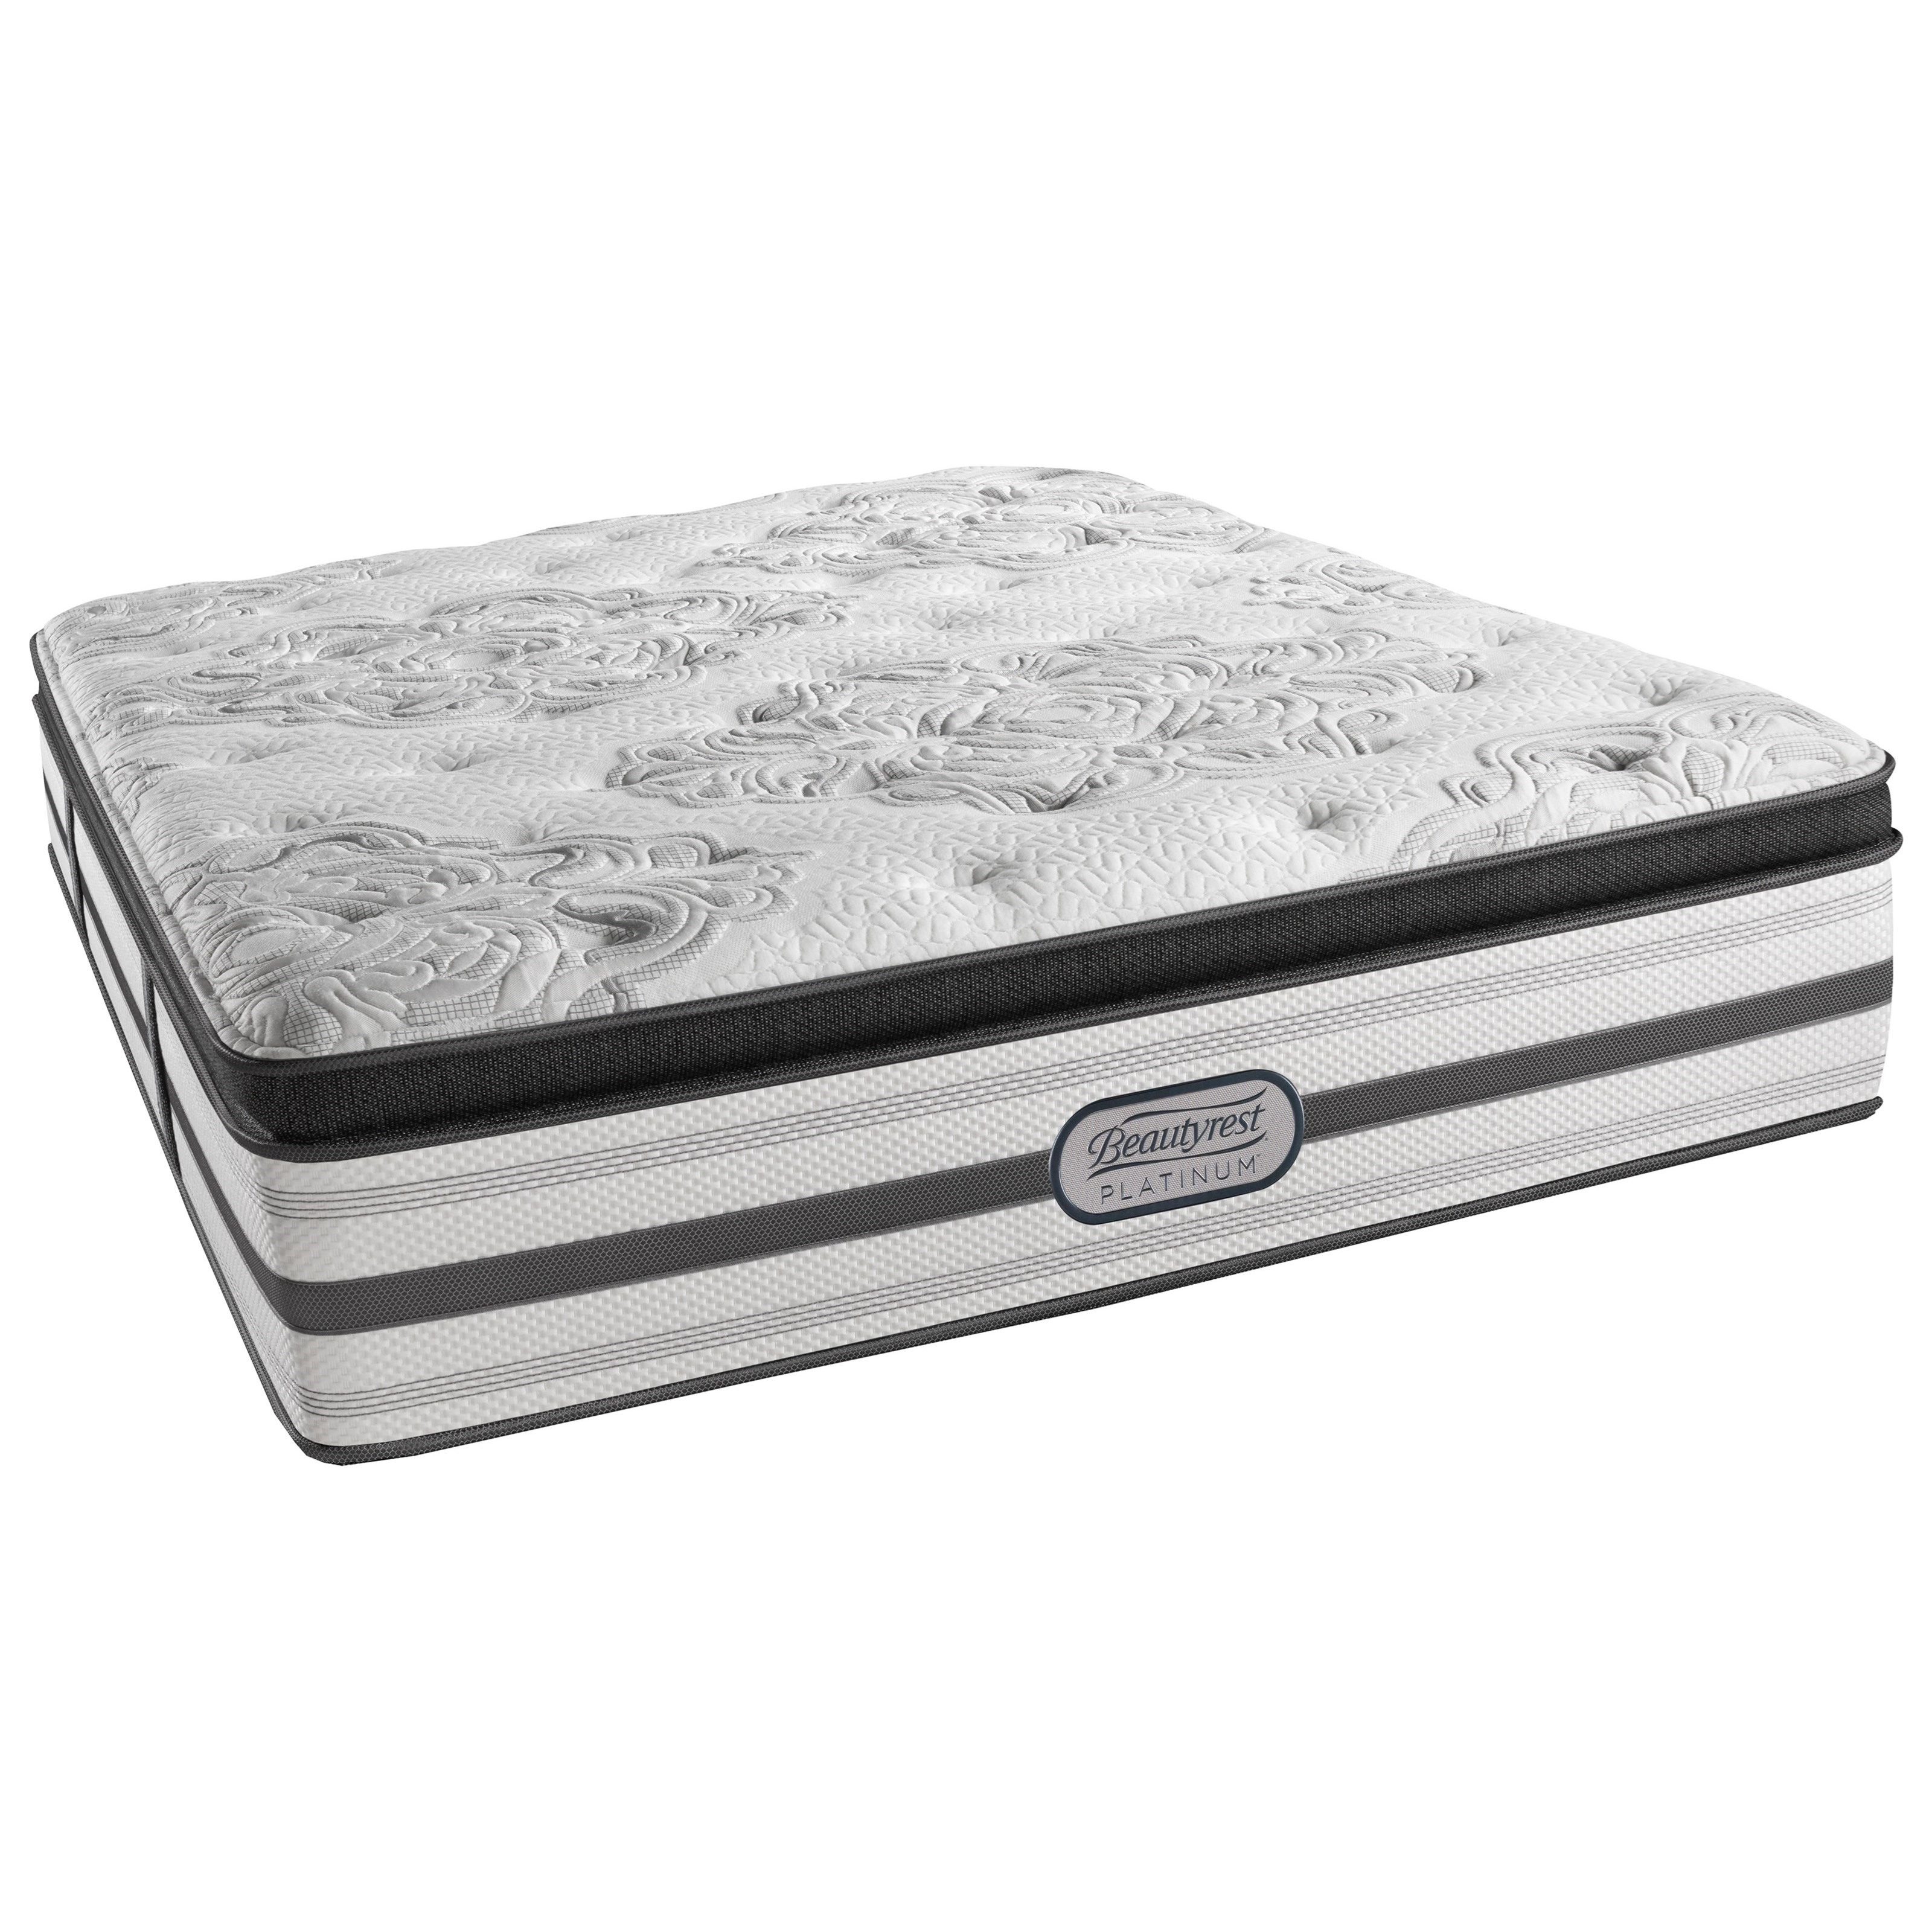 Beautyrest Platinum Gabriella Queen Luxury Firm Pillow Top Adjustable Set - Item Number: LV3LFPT-Q+SM3-Q